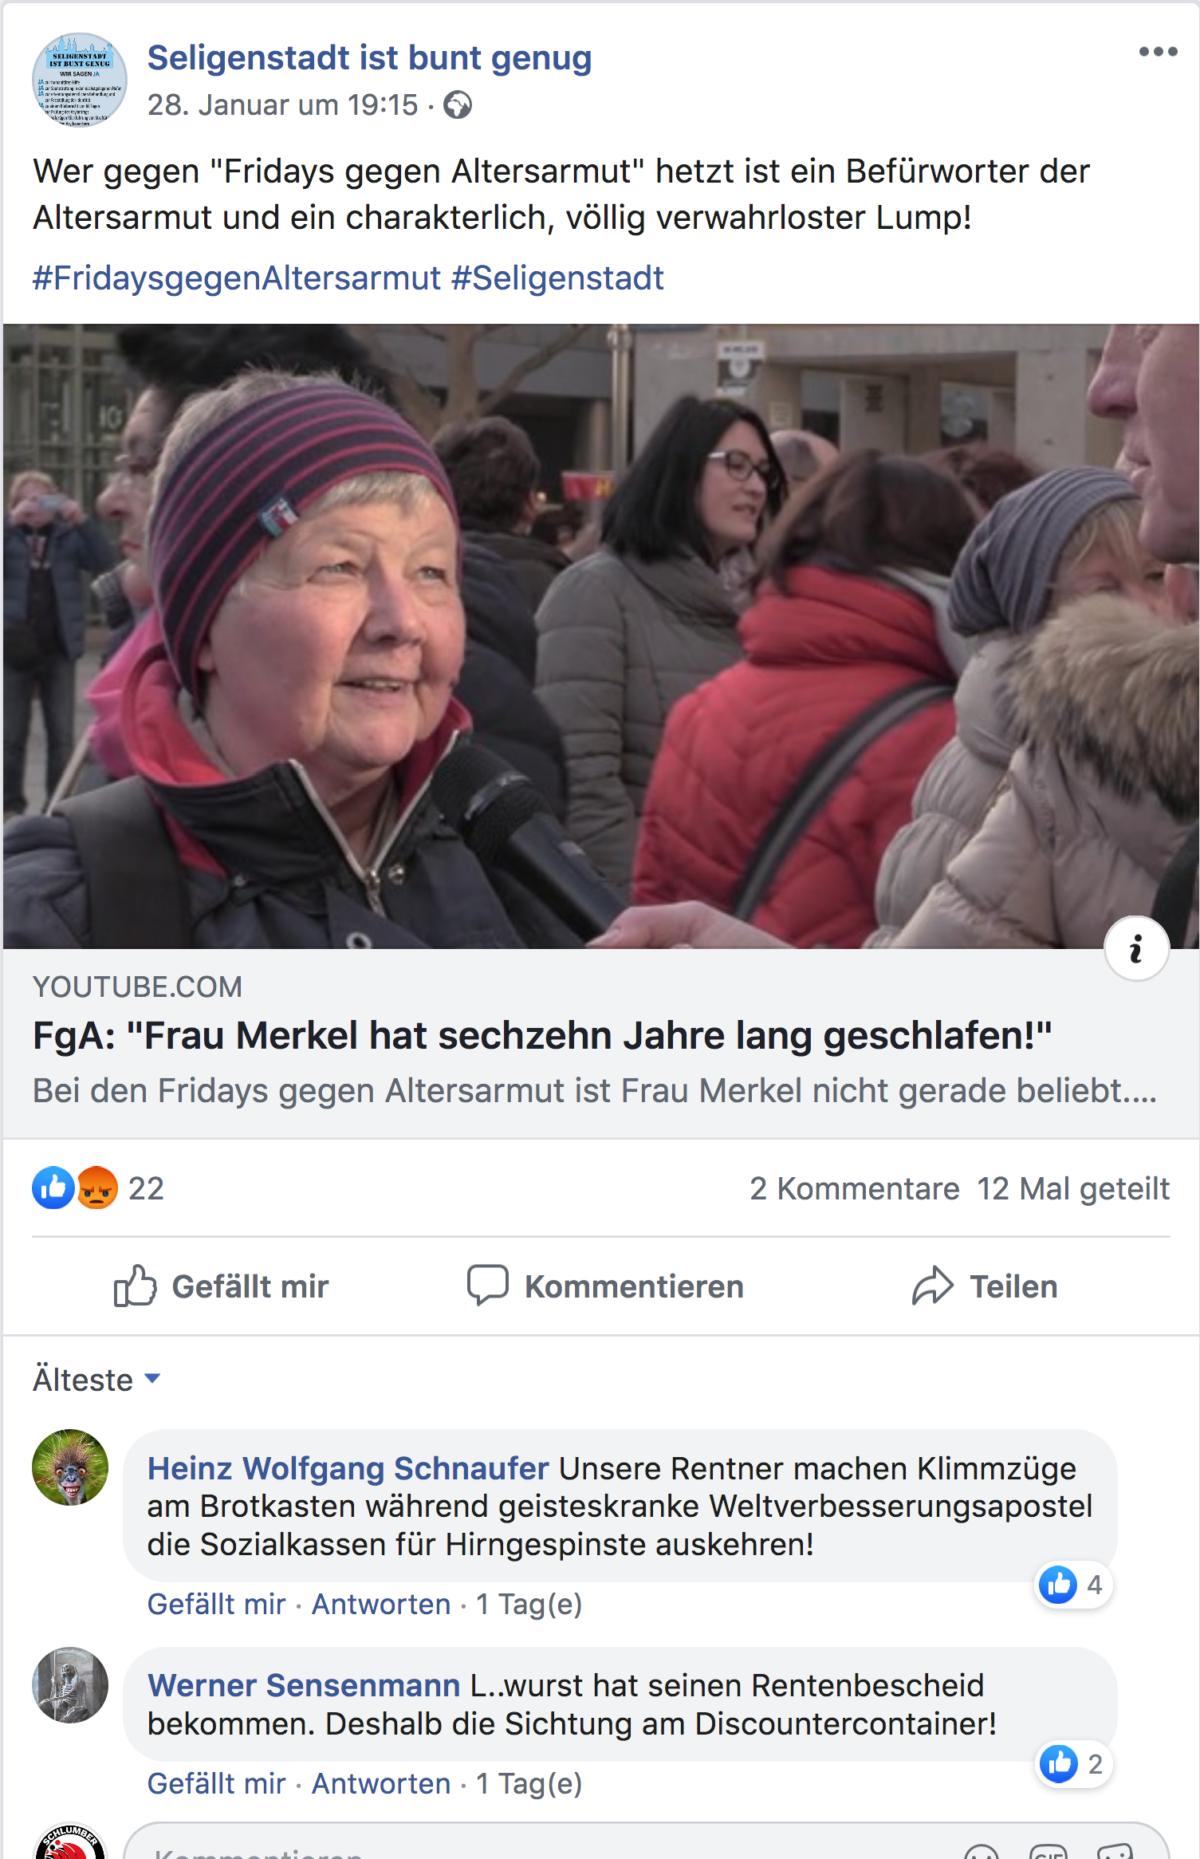 FgAS,Fridays gegen Altersarmut Seligenstadt pic_20959